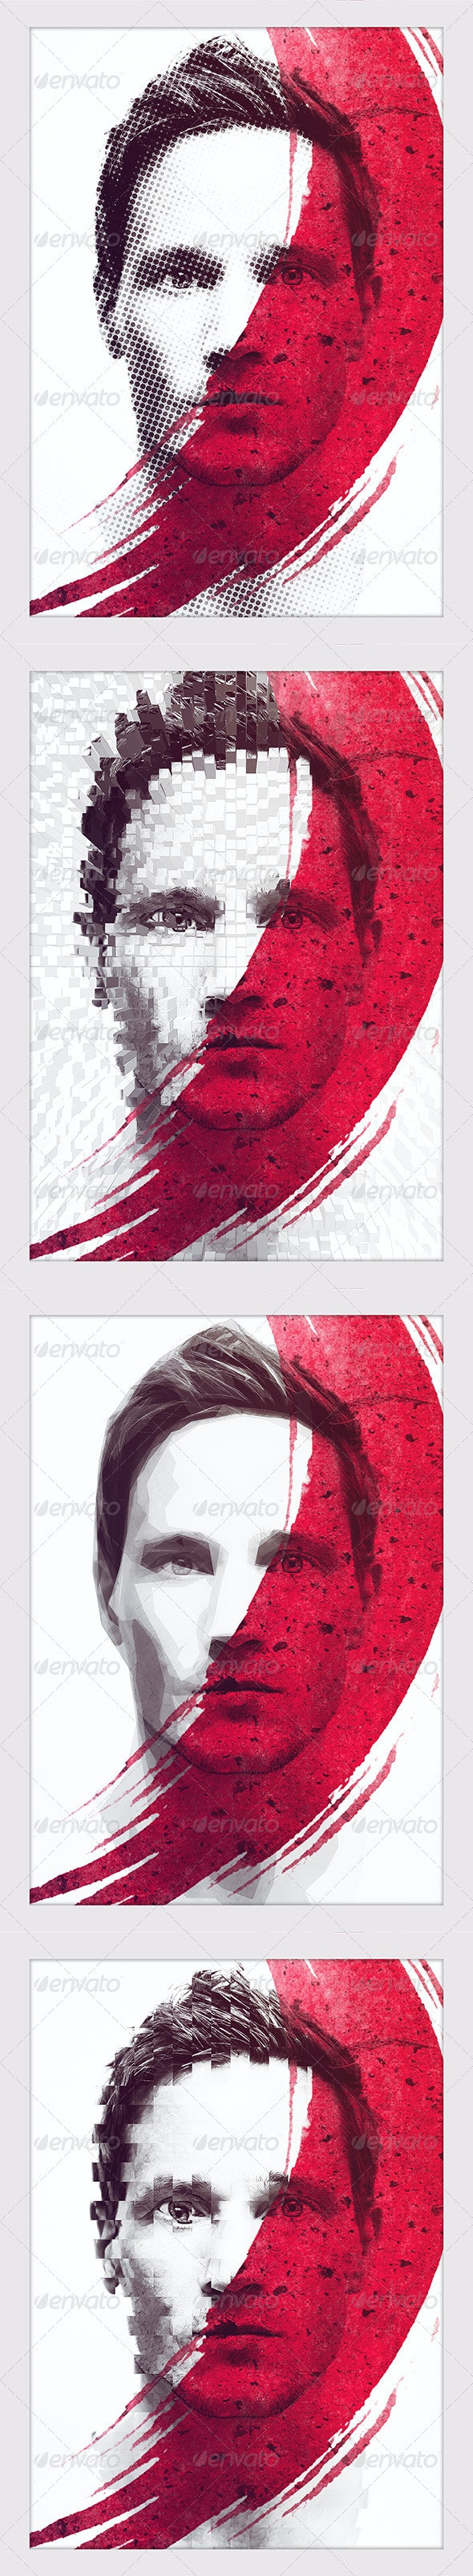 Dream Template Premium Effects - Artistic Photo Templates